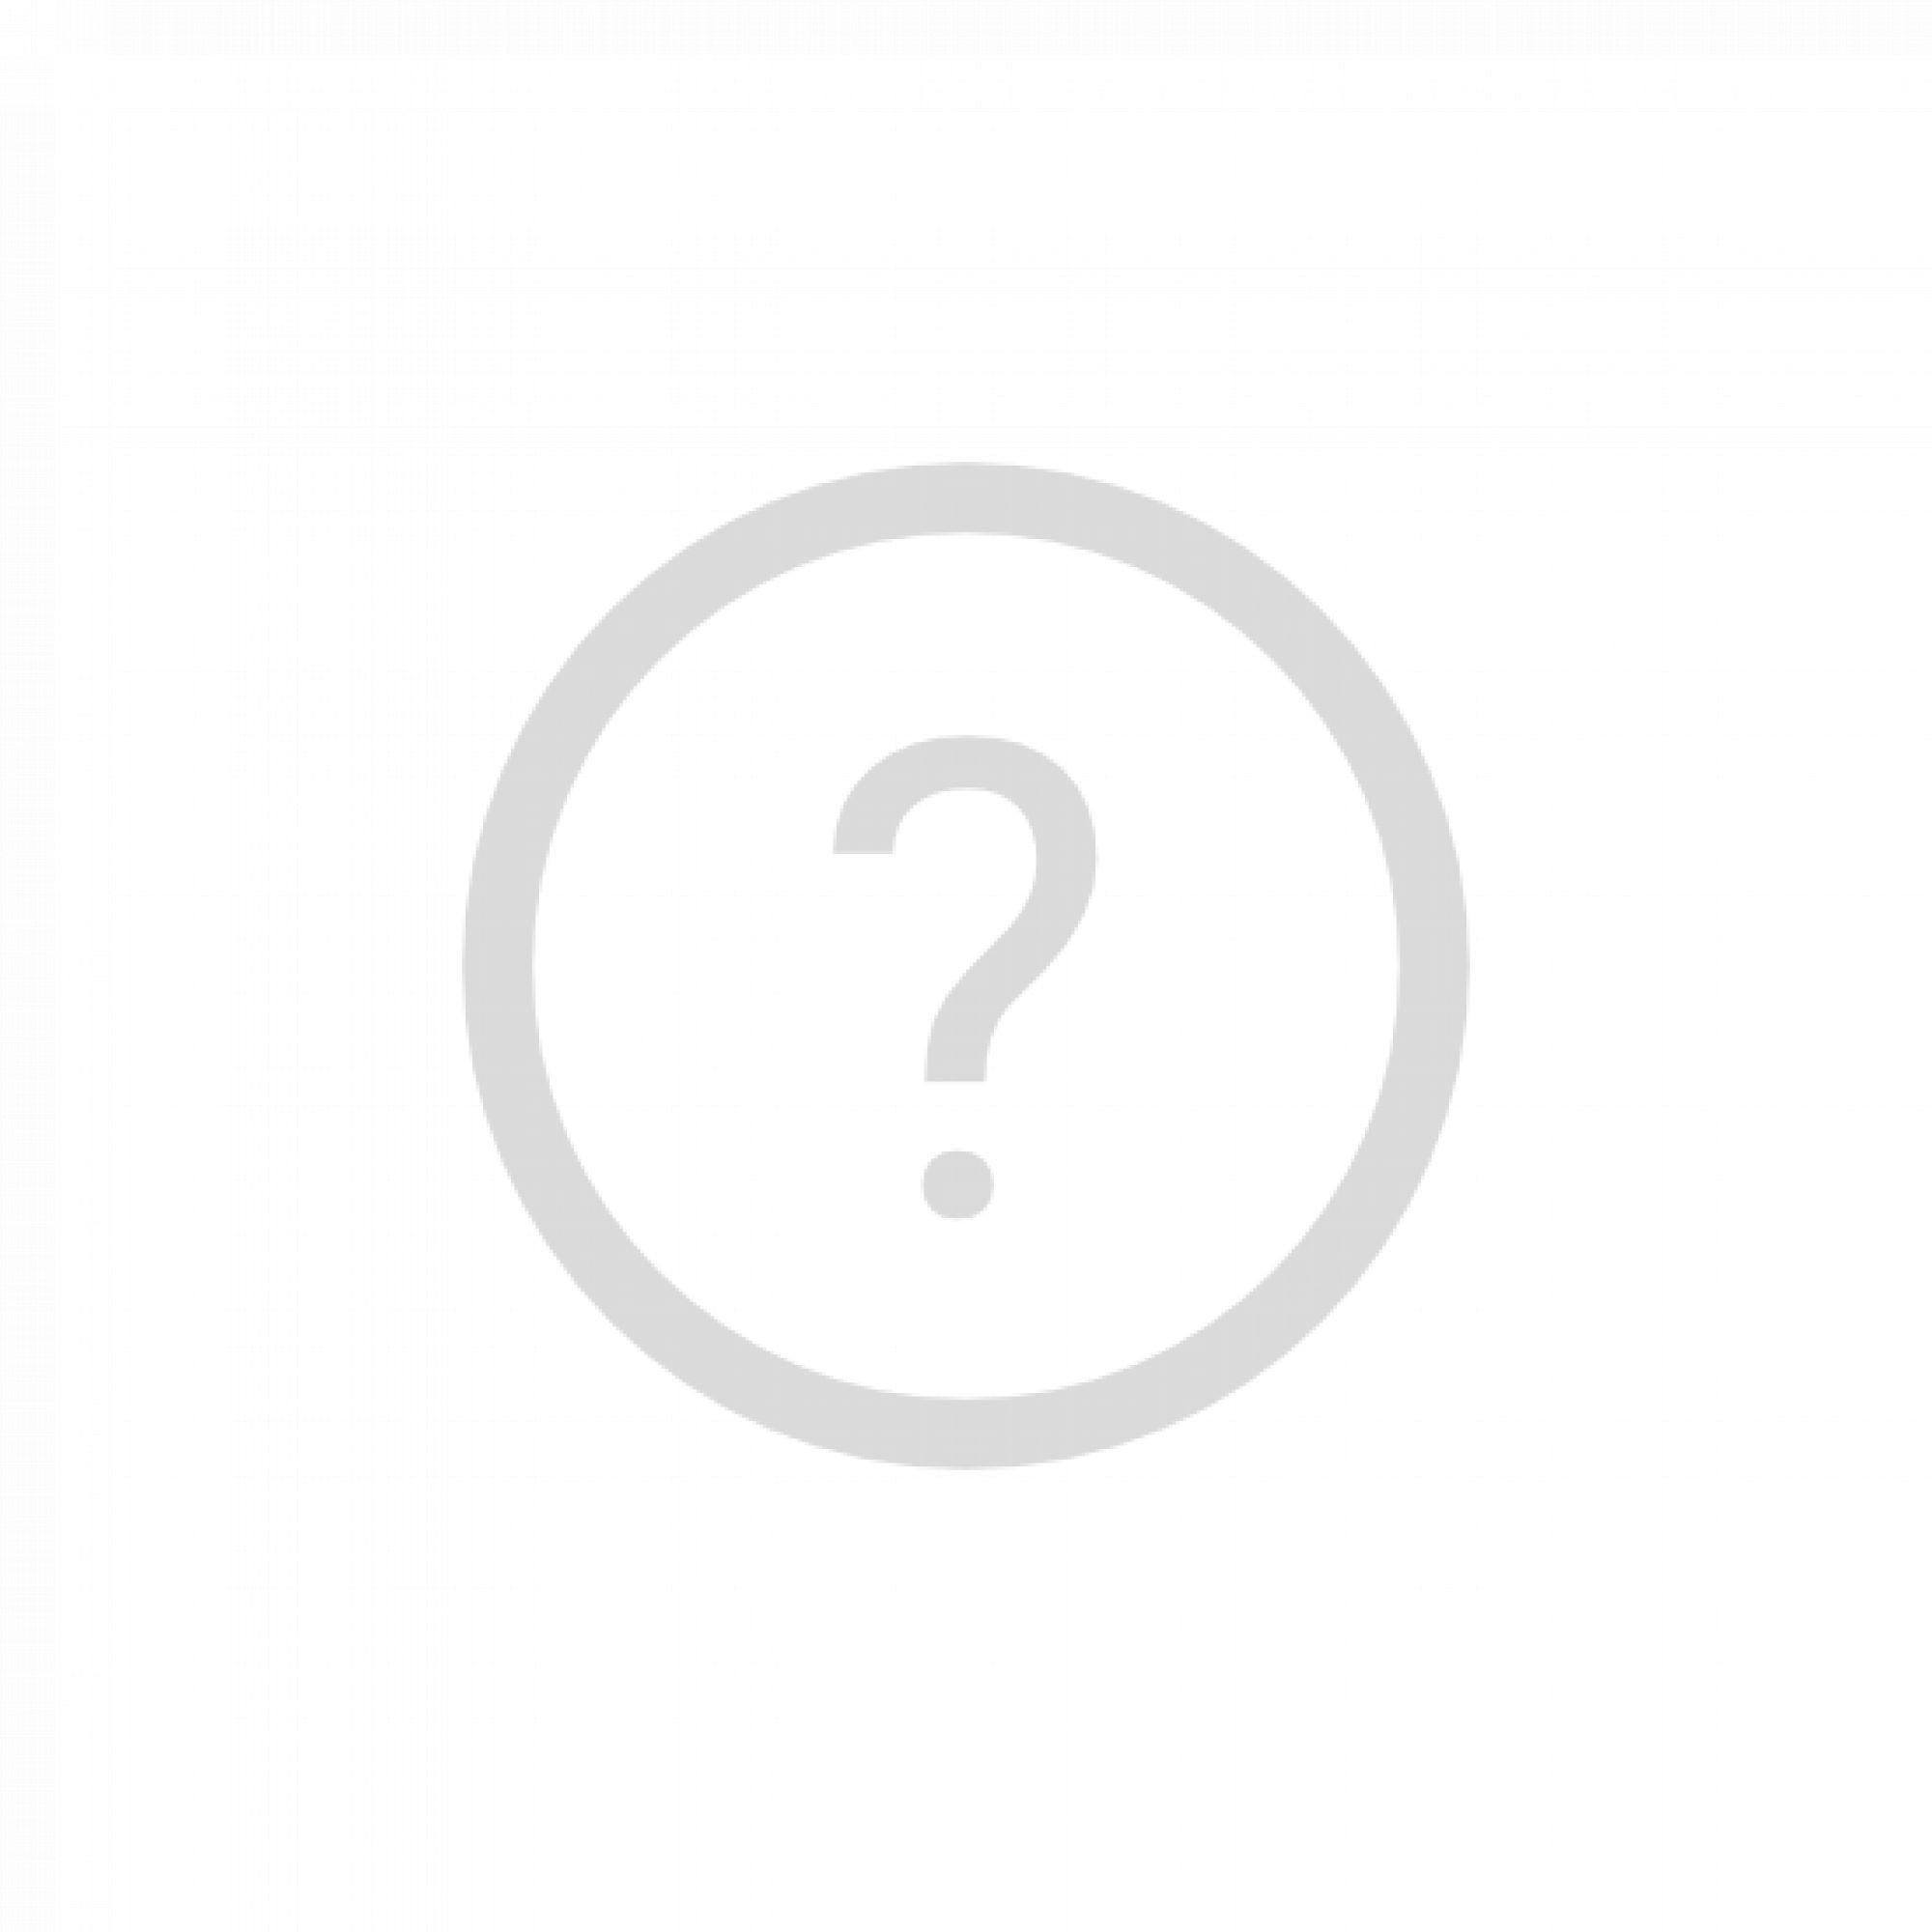 oxigin 18 concave felgen black foil blue felgenbett logo. Black Bedroom Furniture Sets. Home Design Ideas